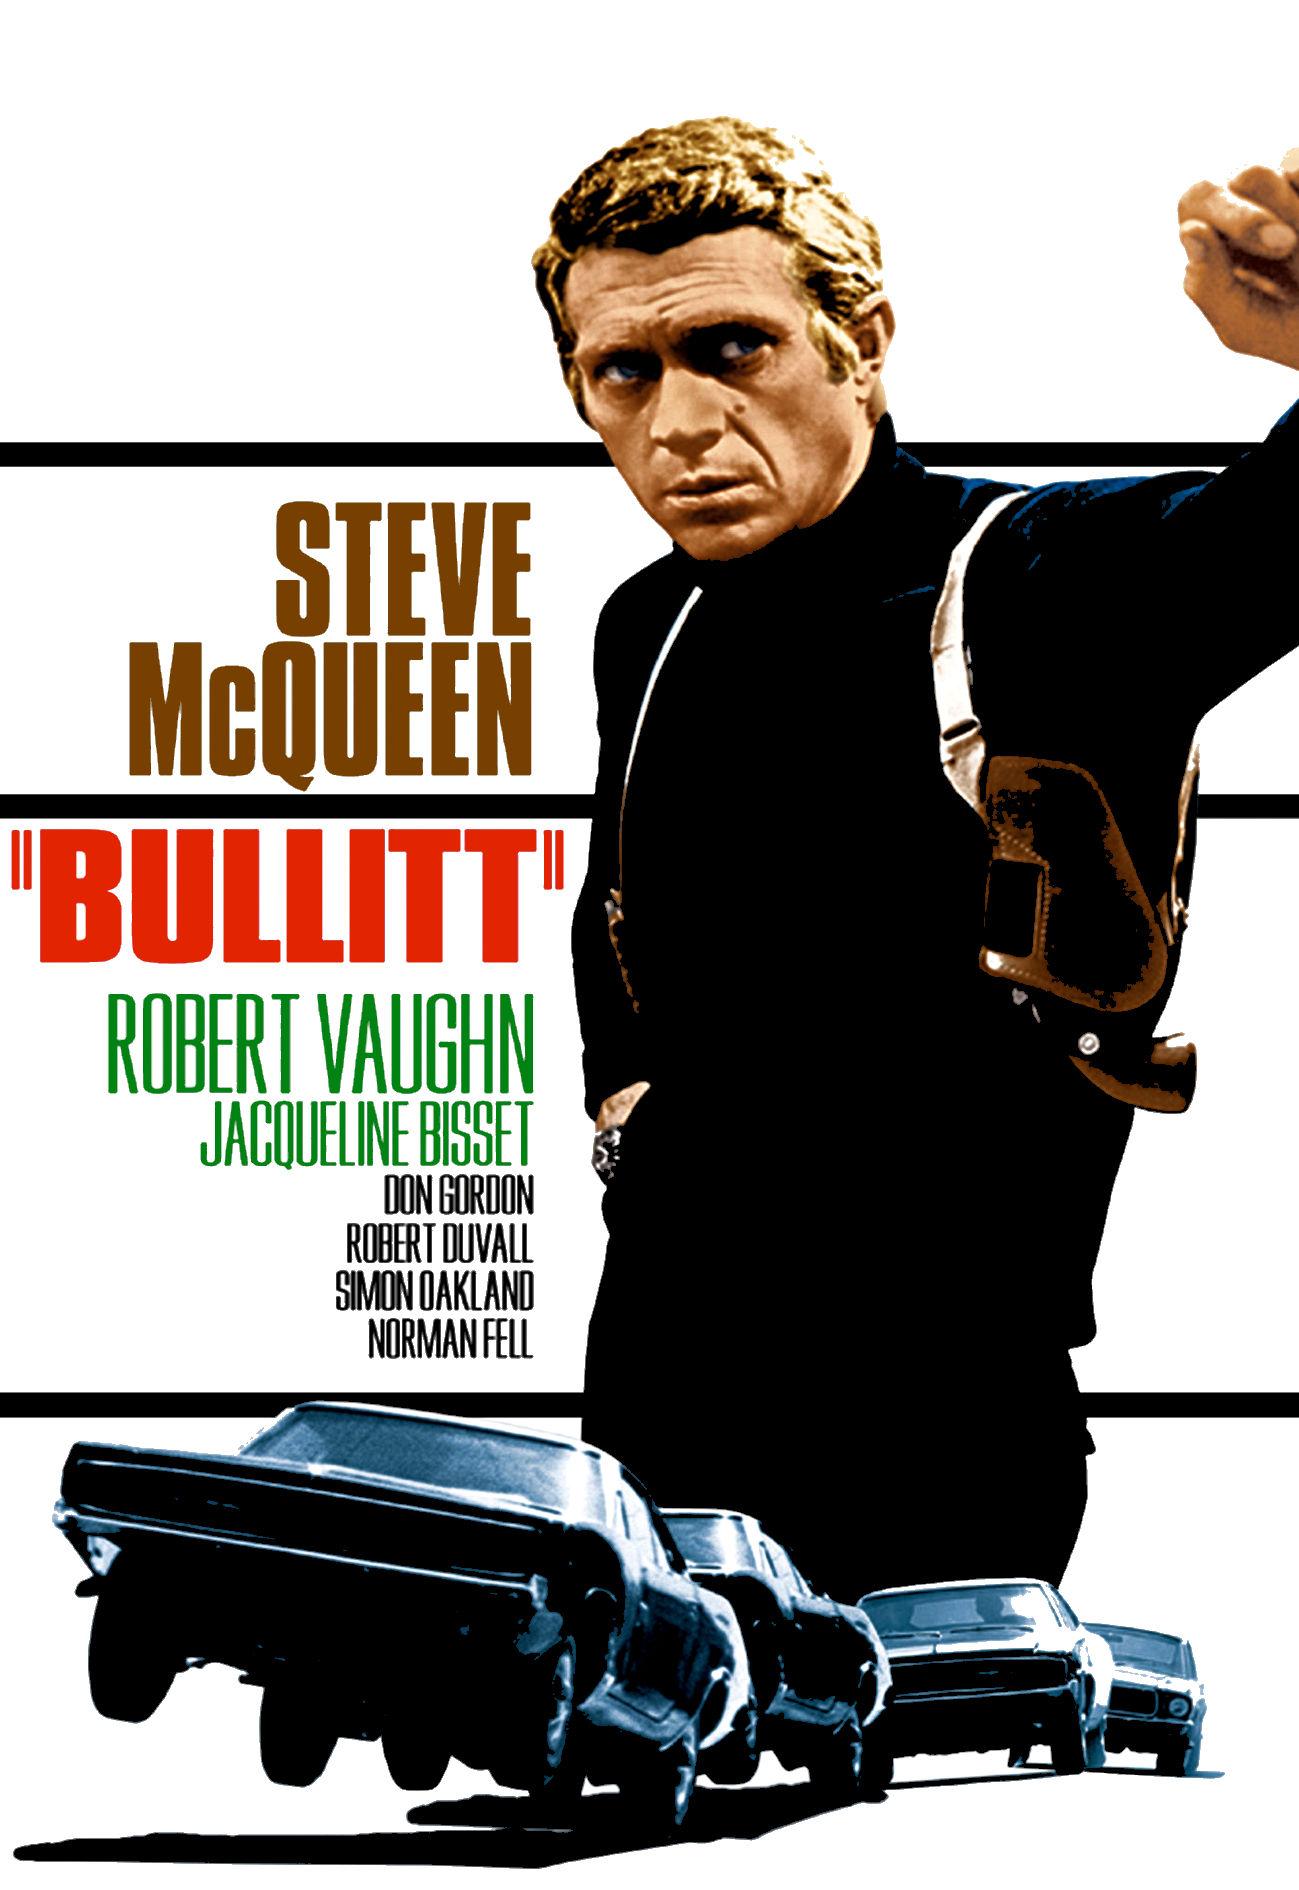 The getaway Steve McQueen cult movie poster print